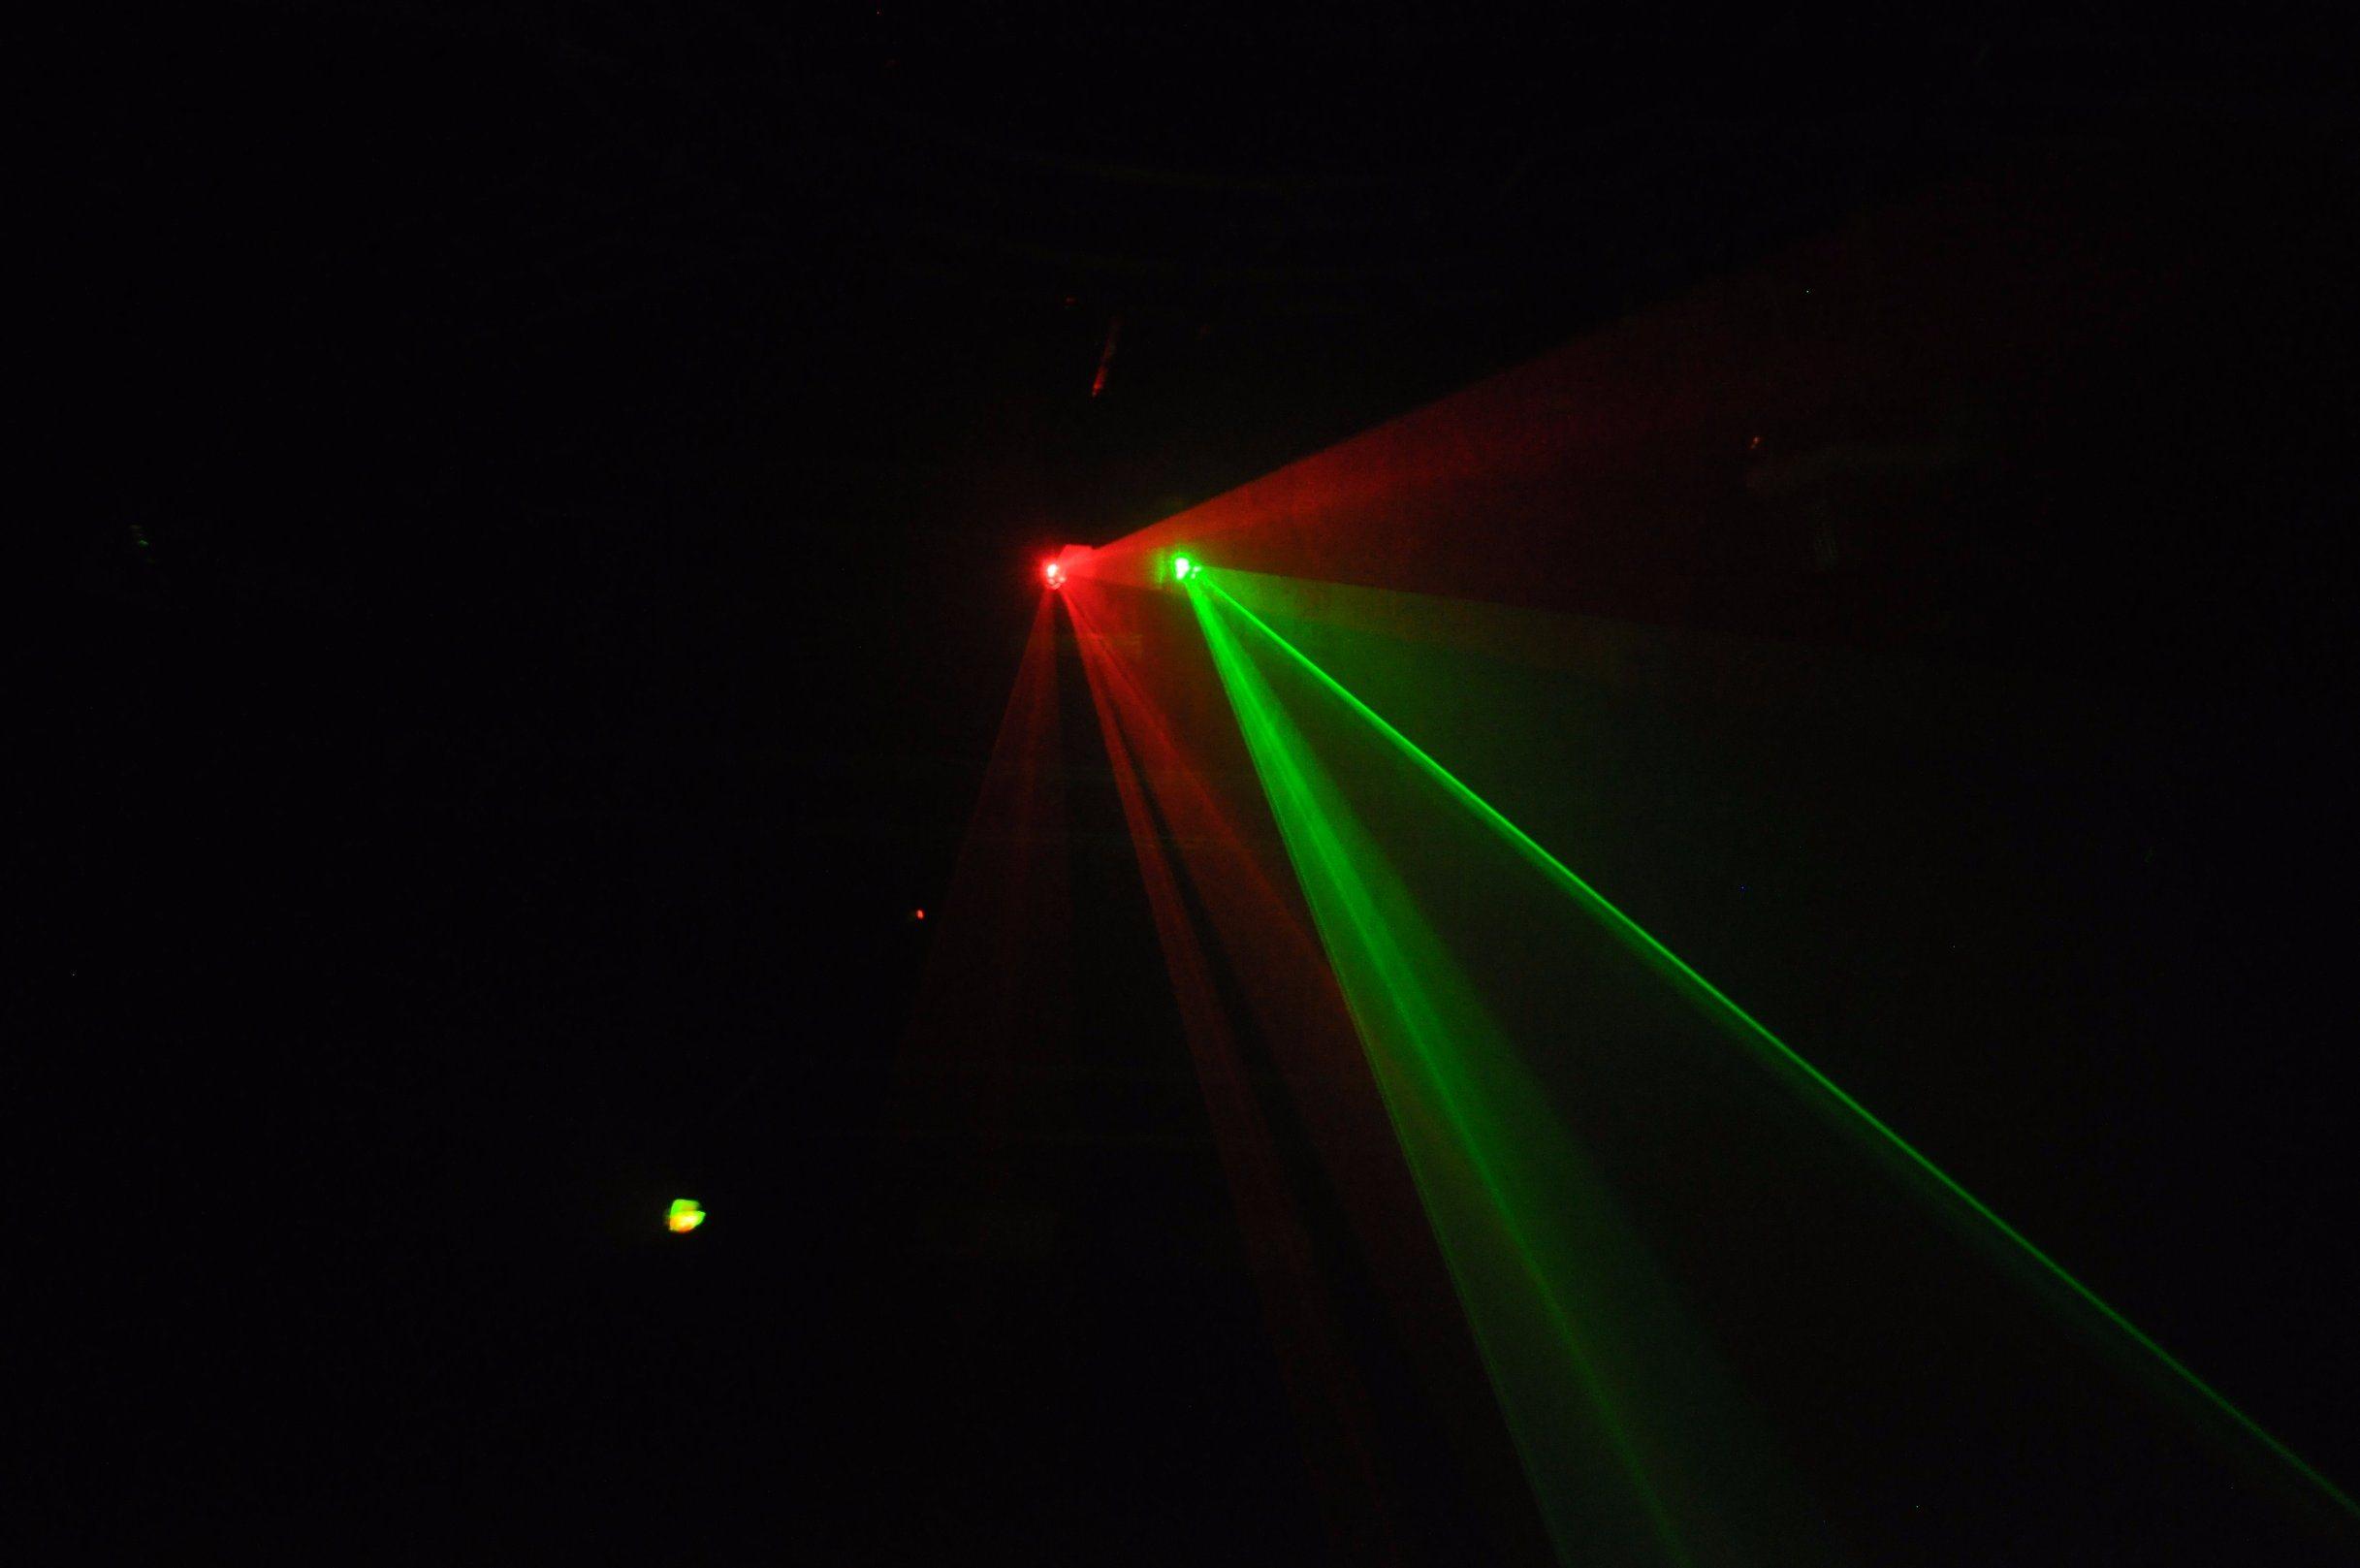 Professtional Double Head Red Green Laser Light